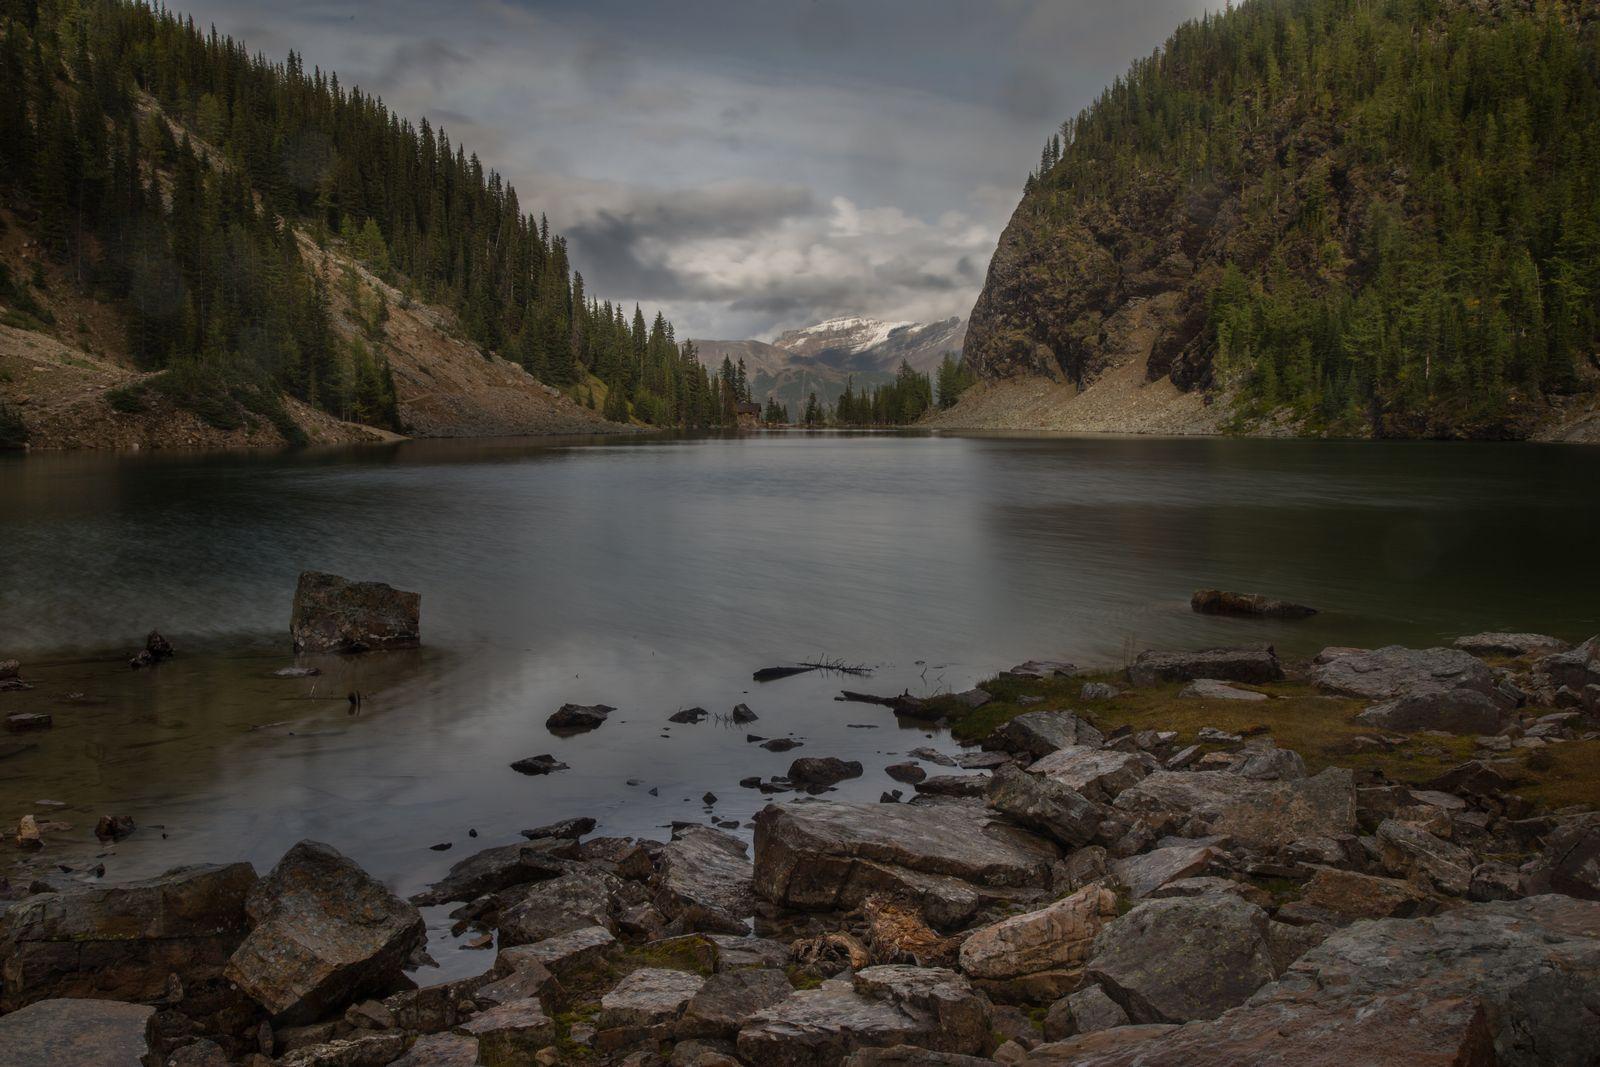 Lake Agnes tras el descenso